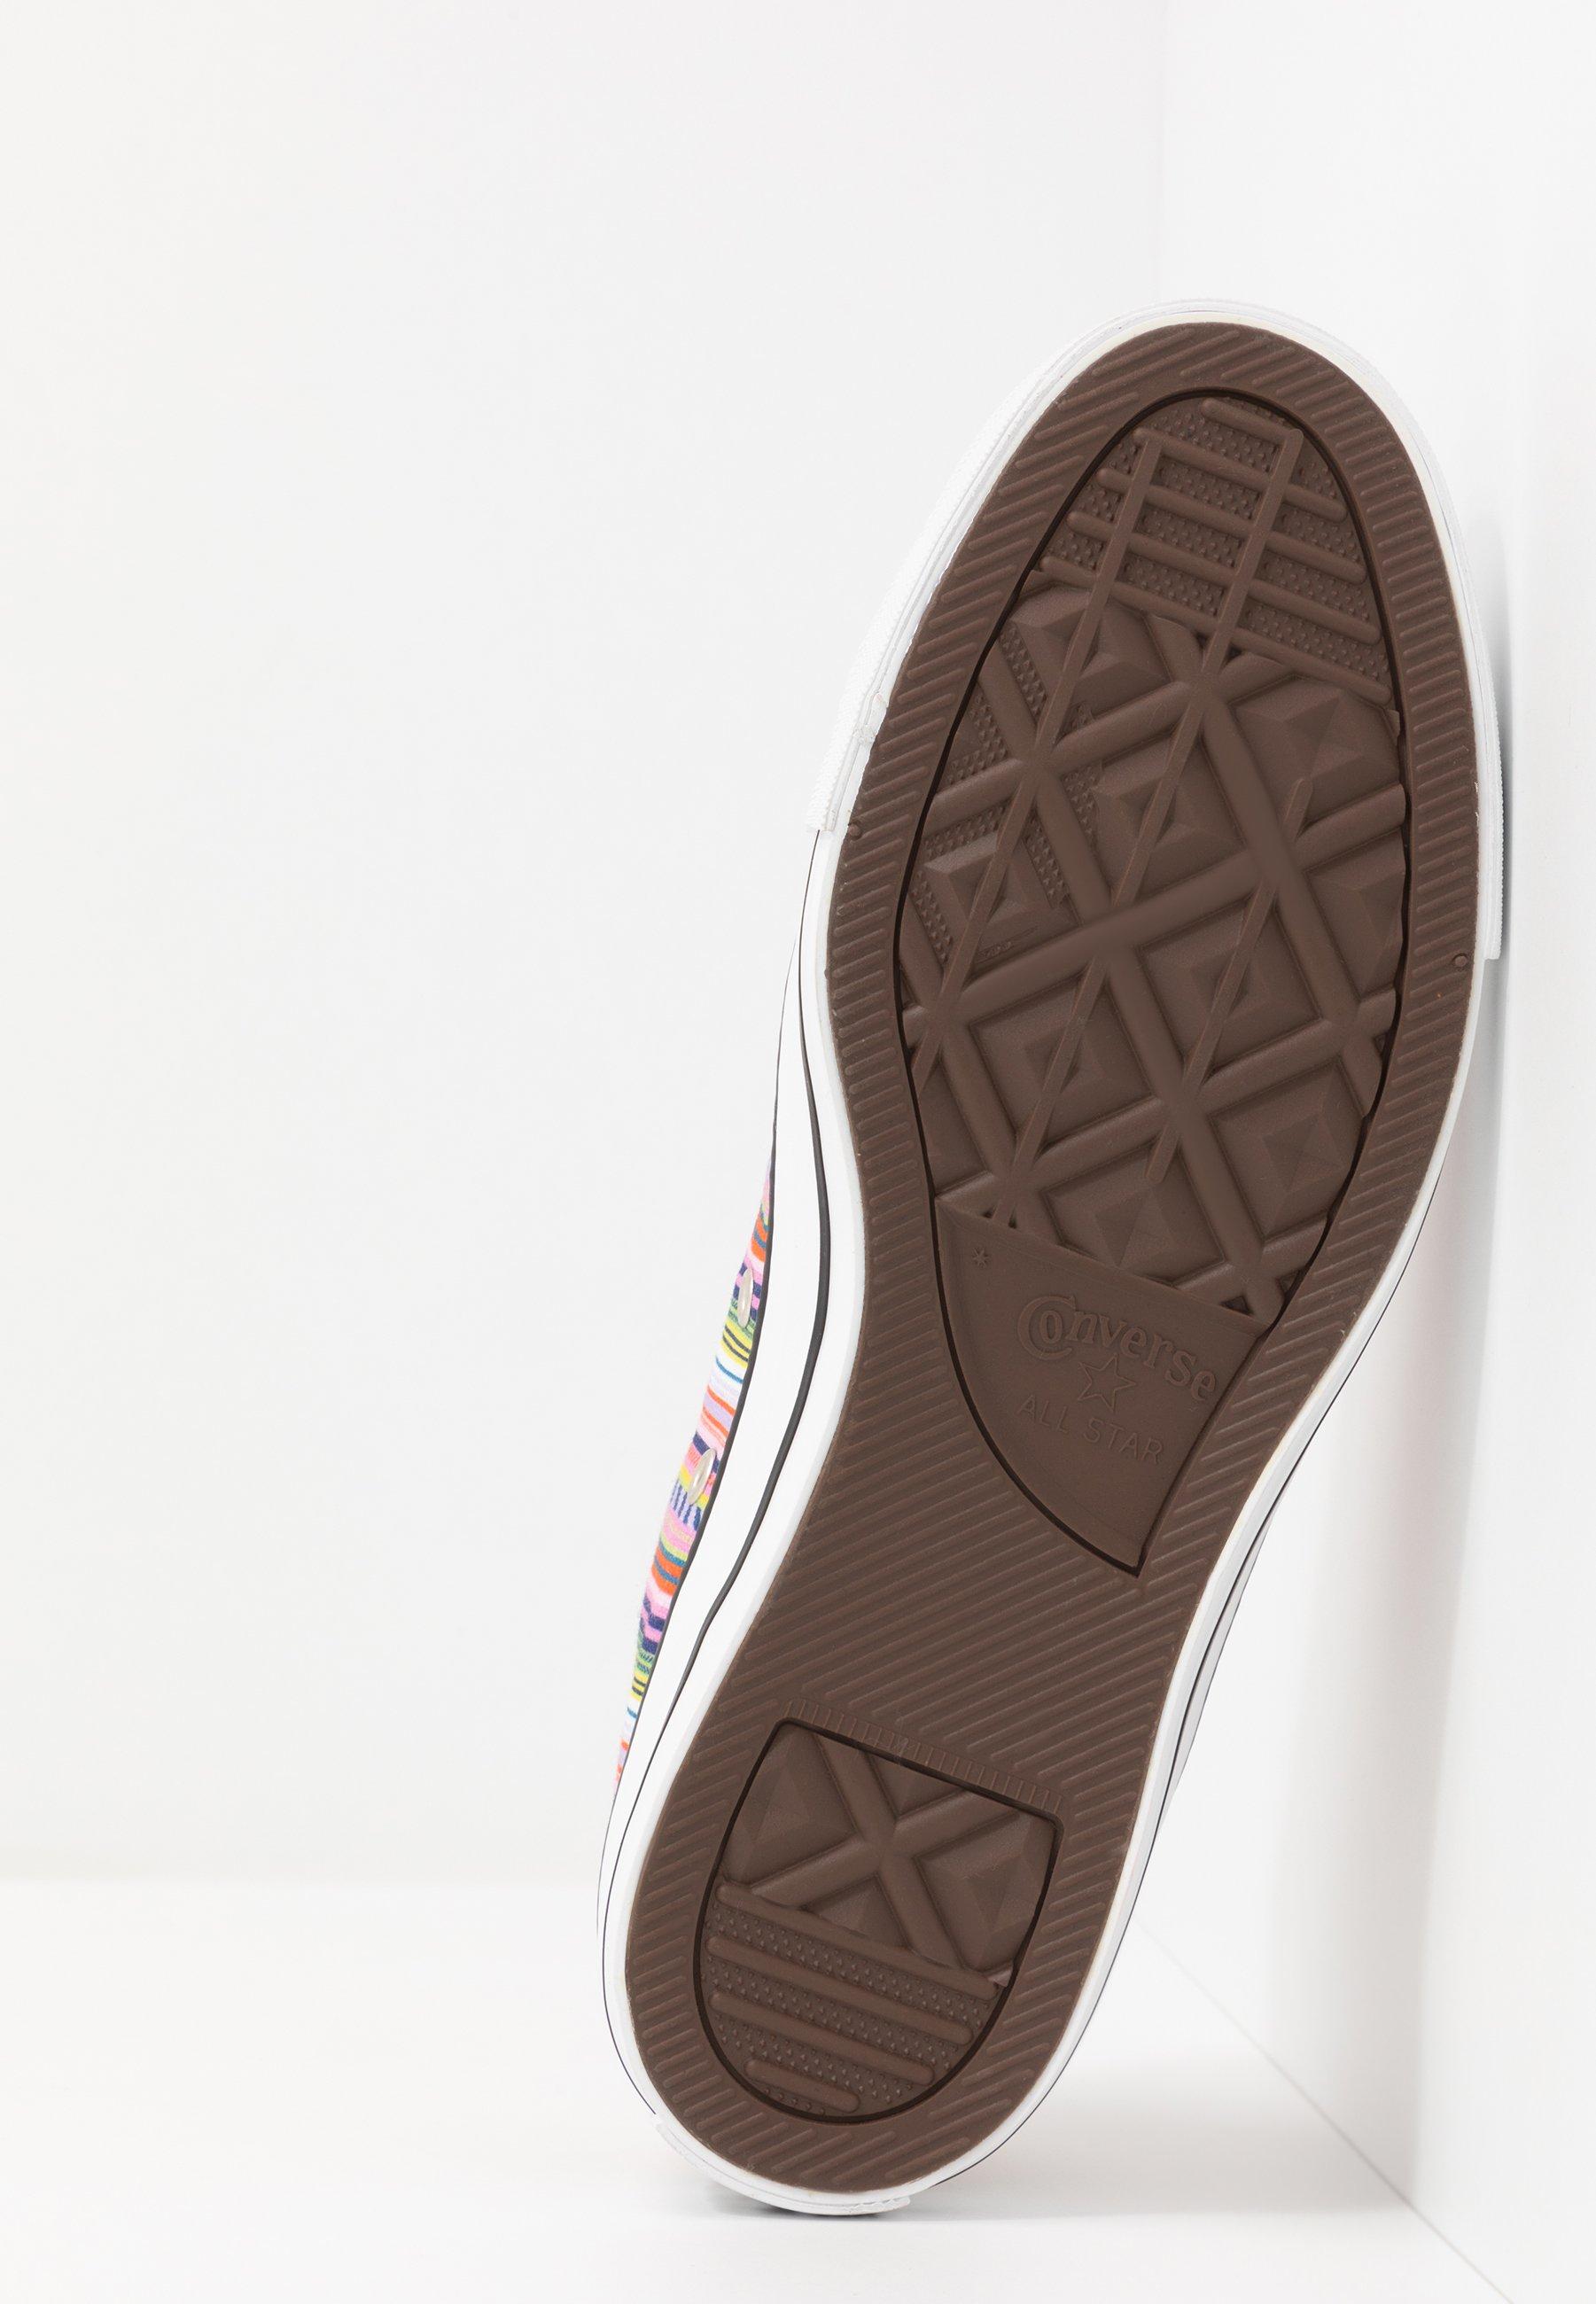 Converse Chuck Taylor All Star - Sneakers White/multicolor/black